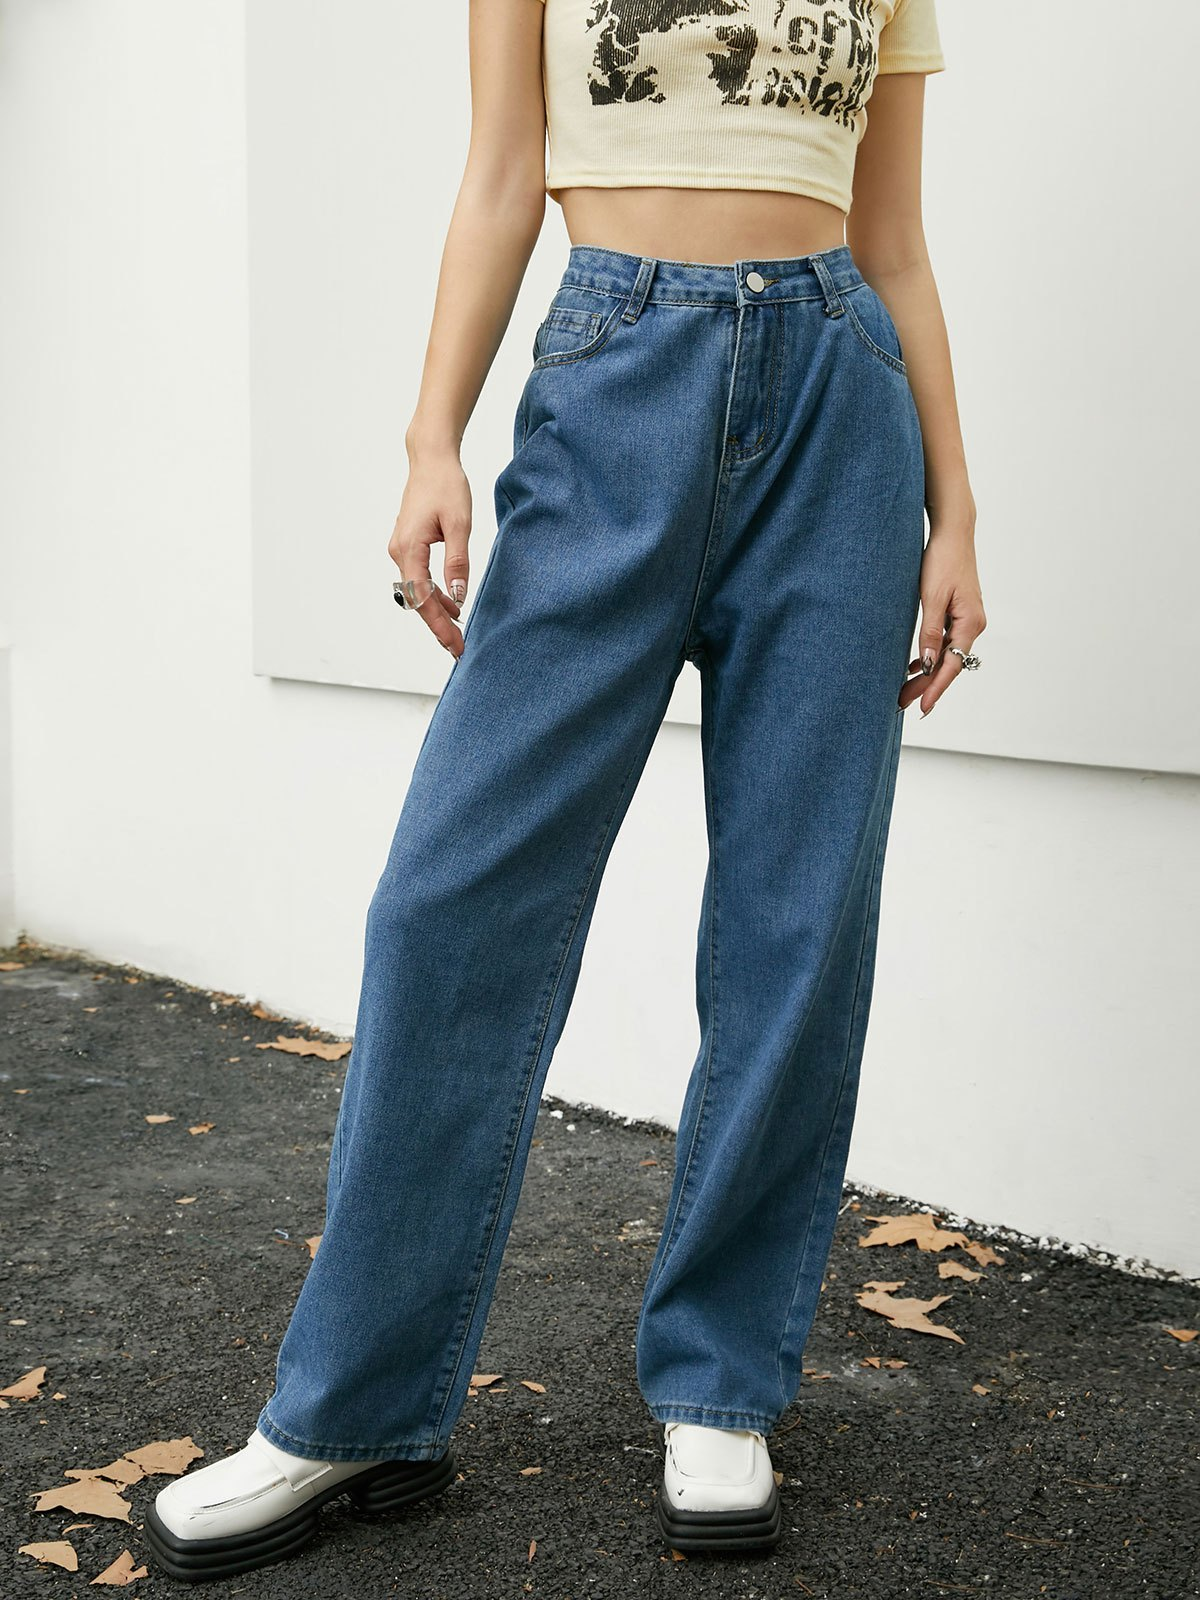 Classic Low Waist Boyfriend Jeans - Blue S